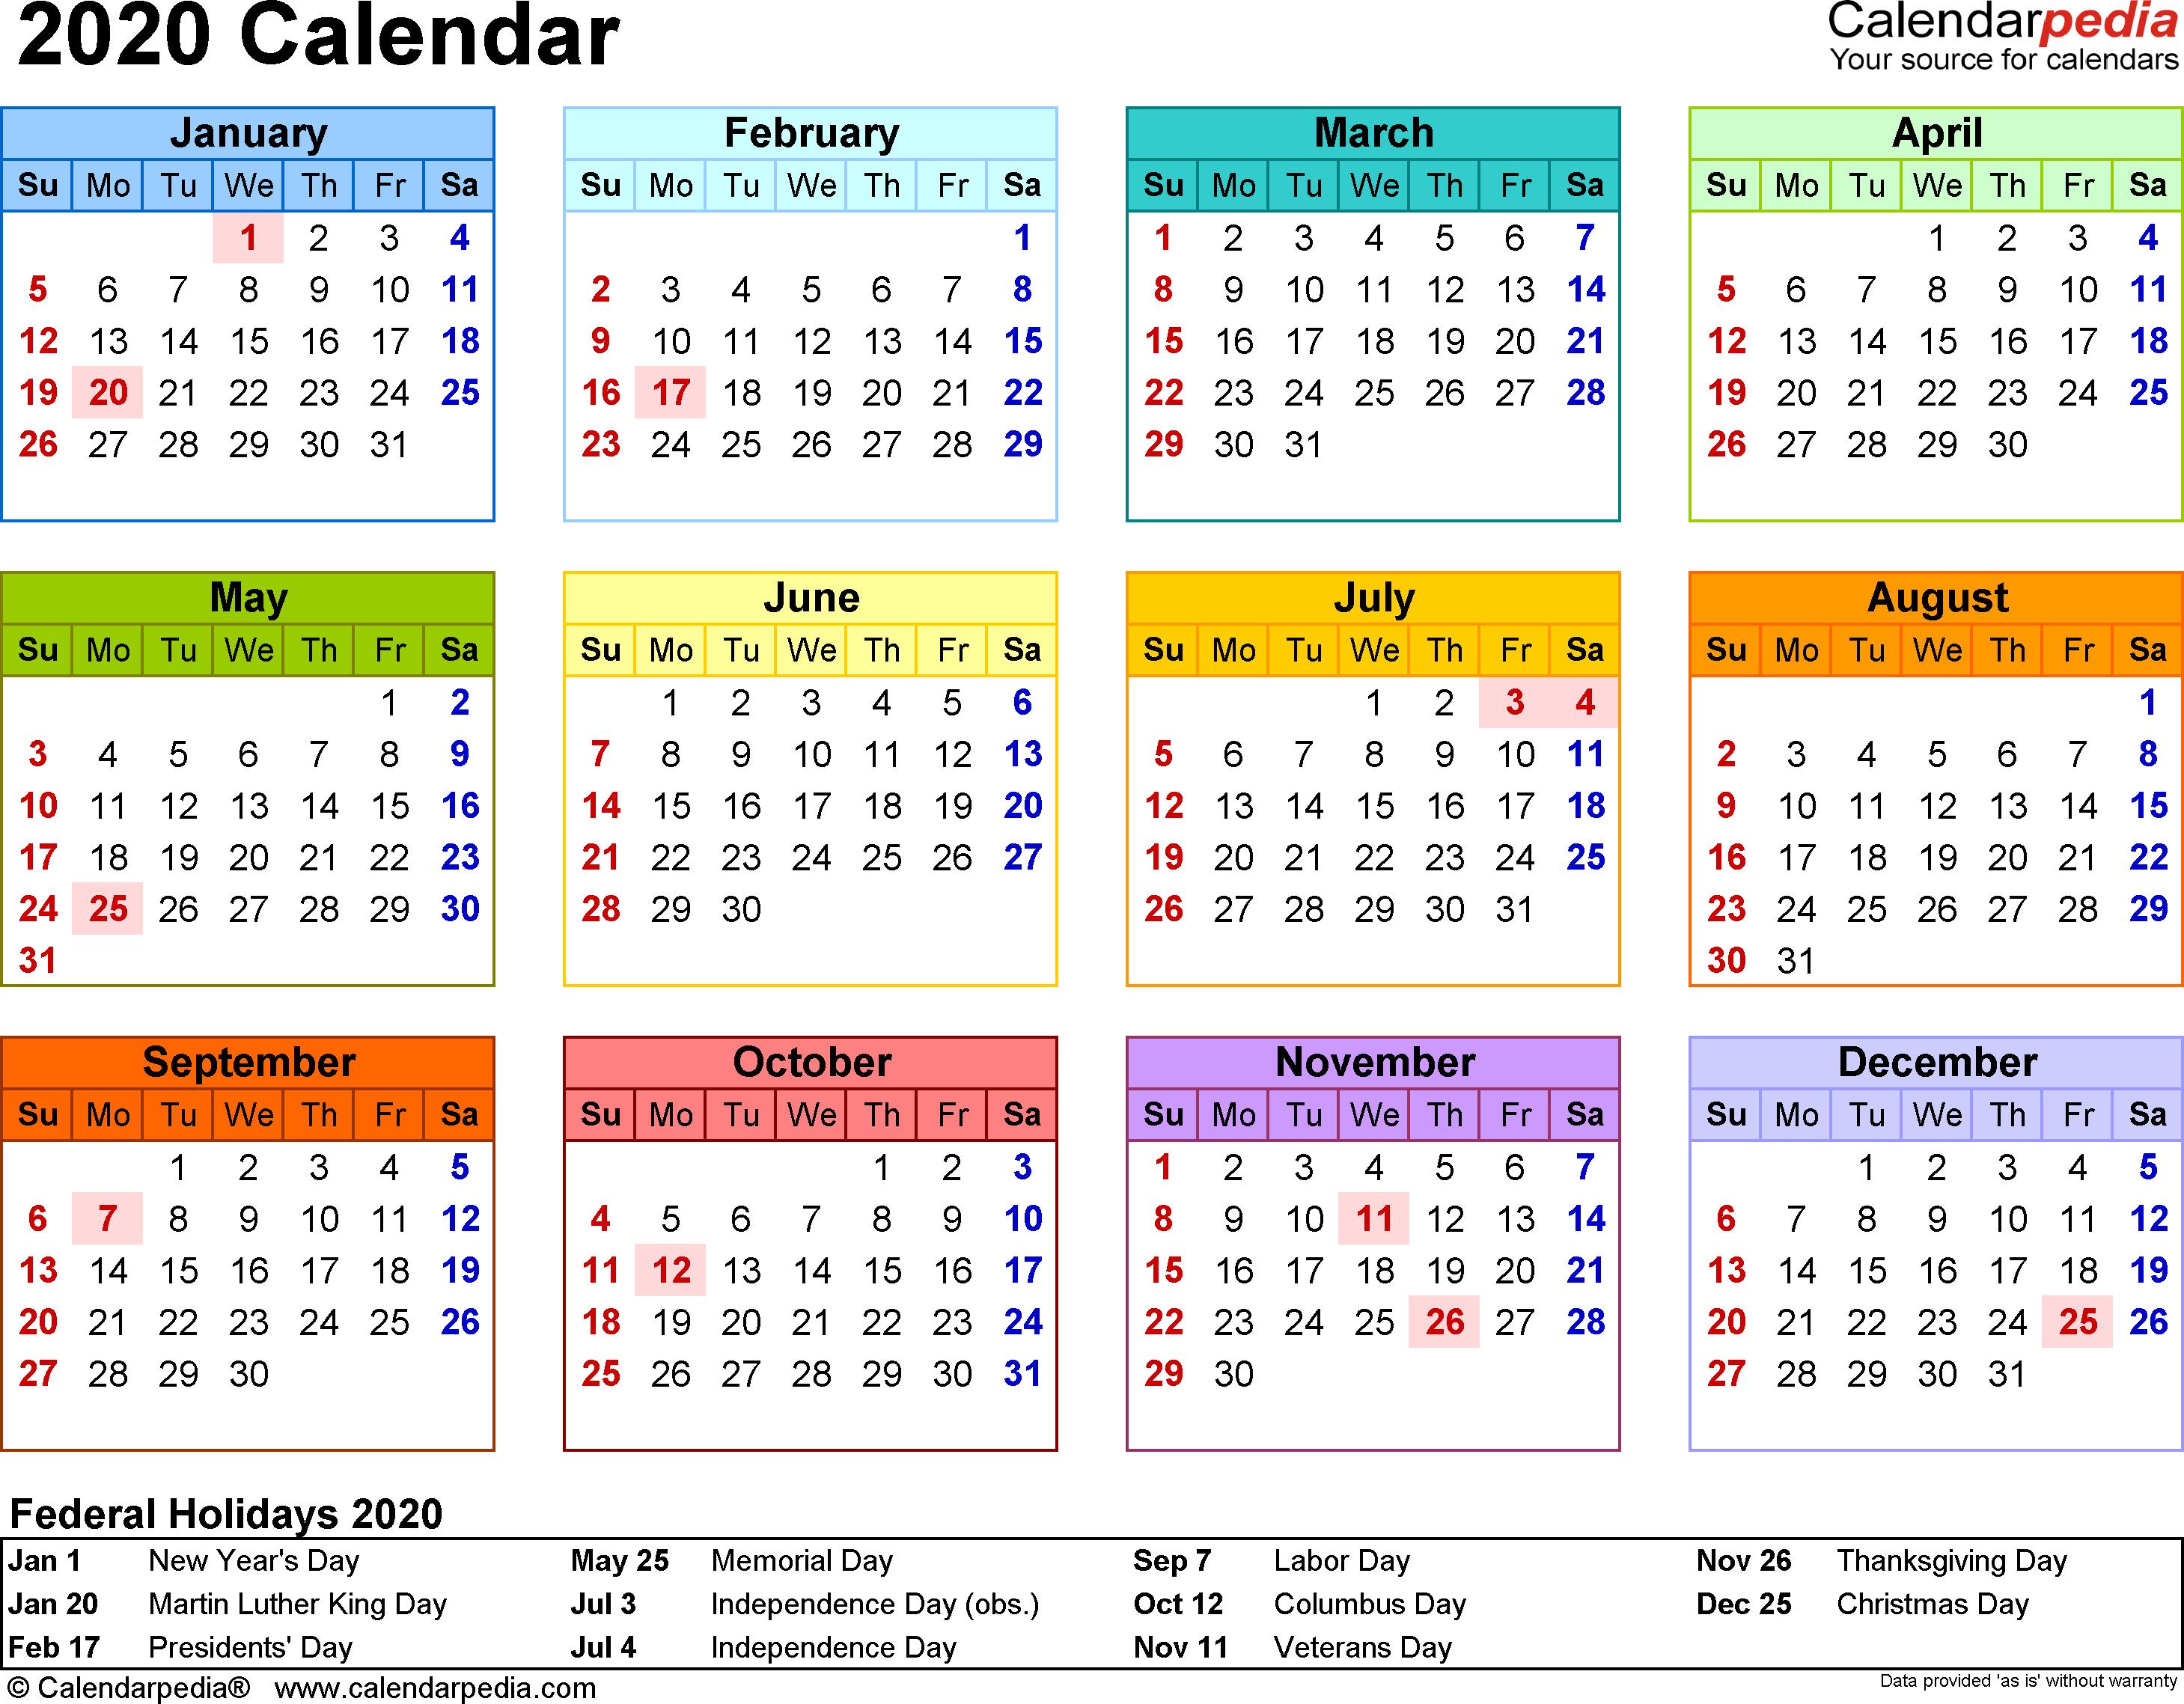 2020 Calendar Pdf - 18 Free Printable Calendar Templates